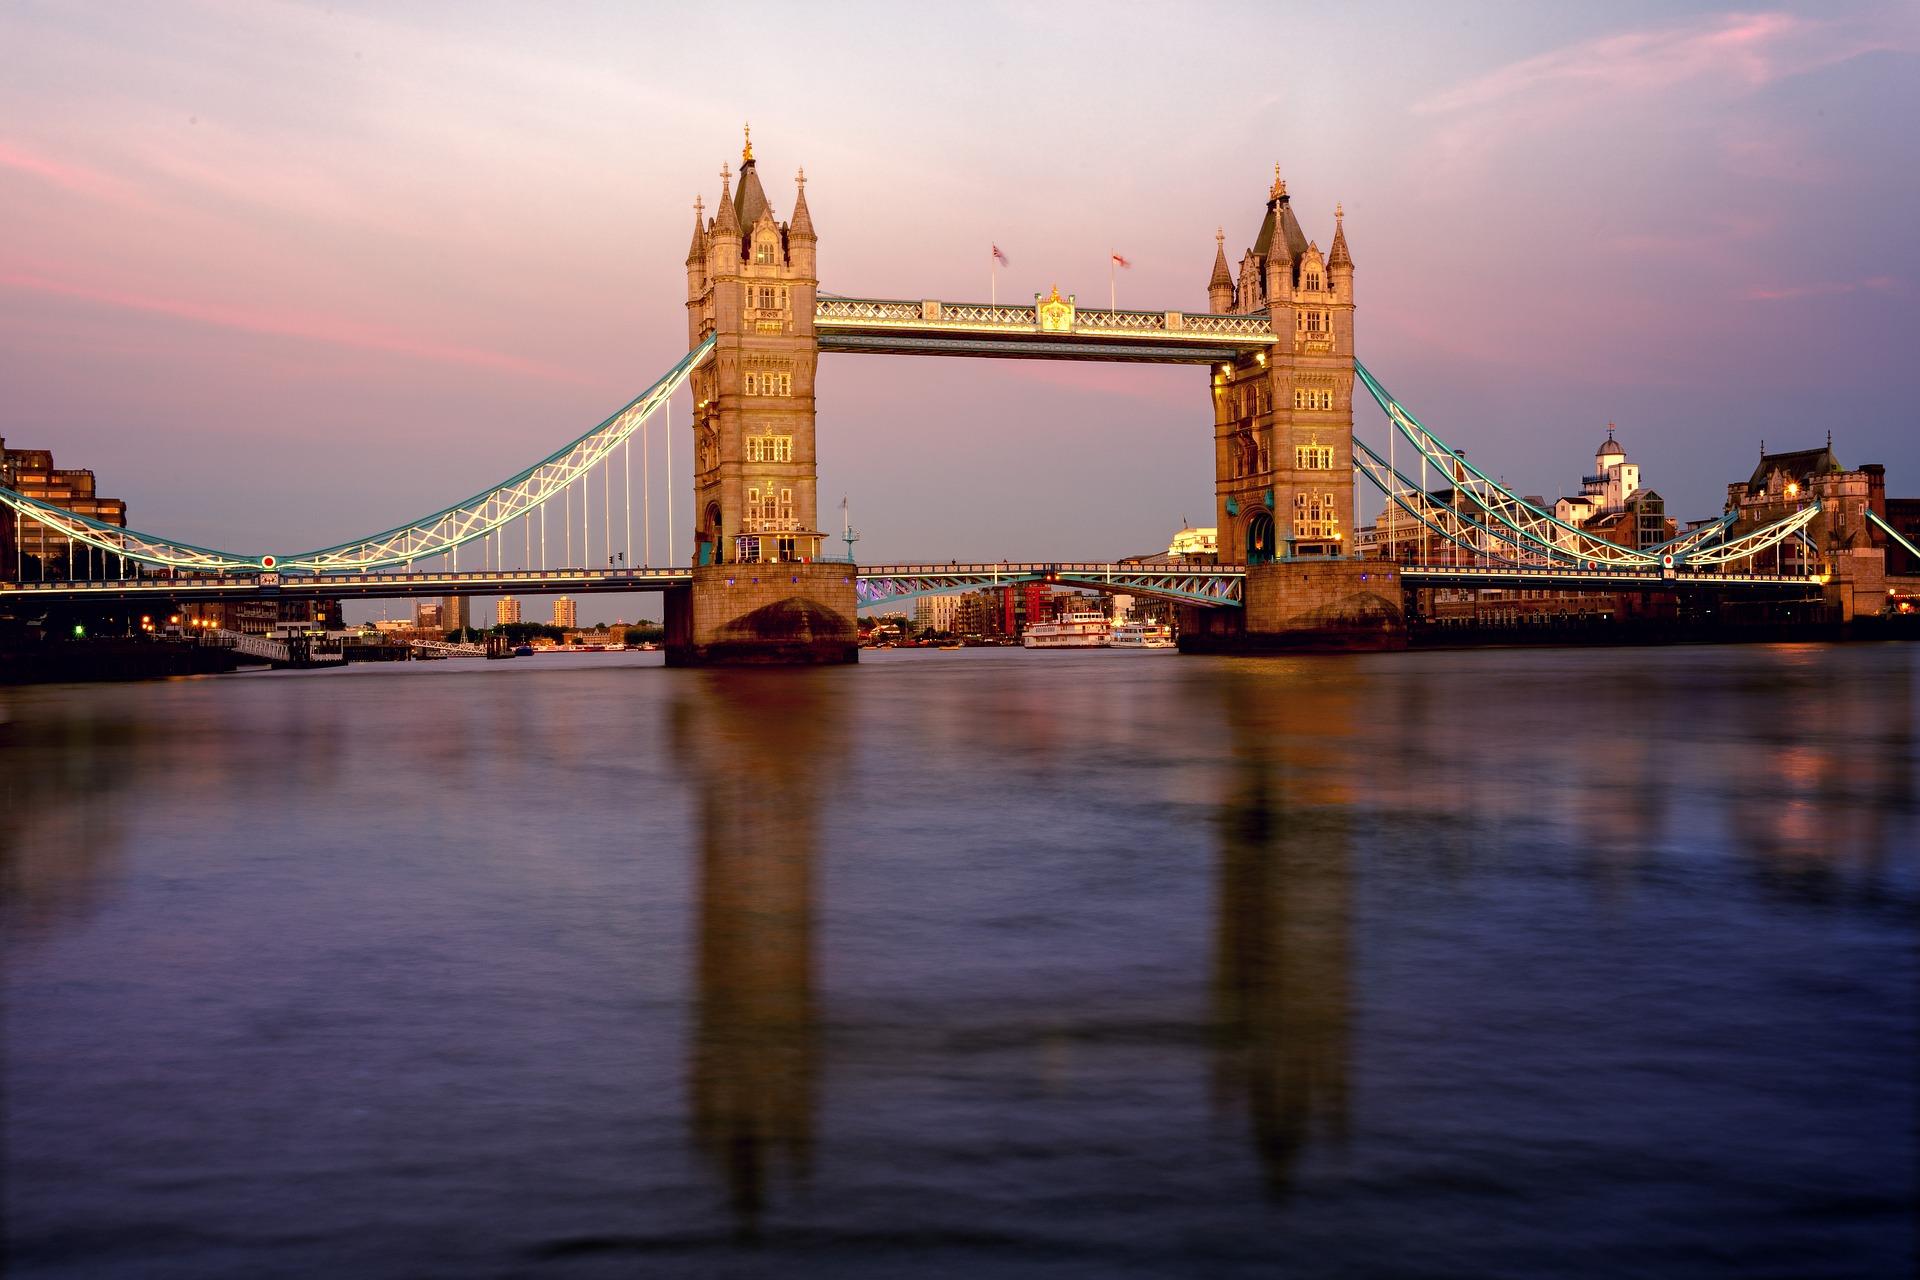 London & Country | Tower Bridge, Thames River, London, England, UK